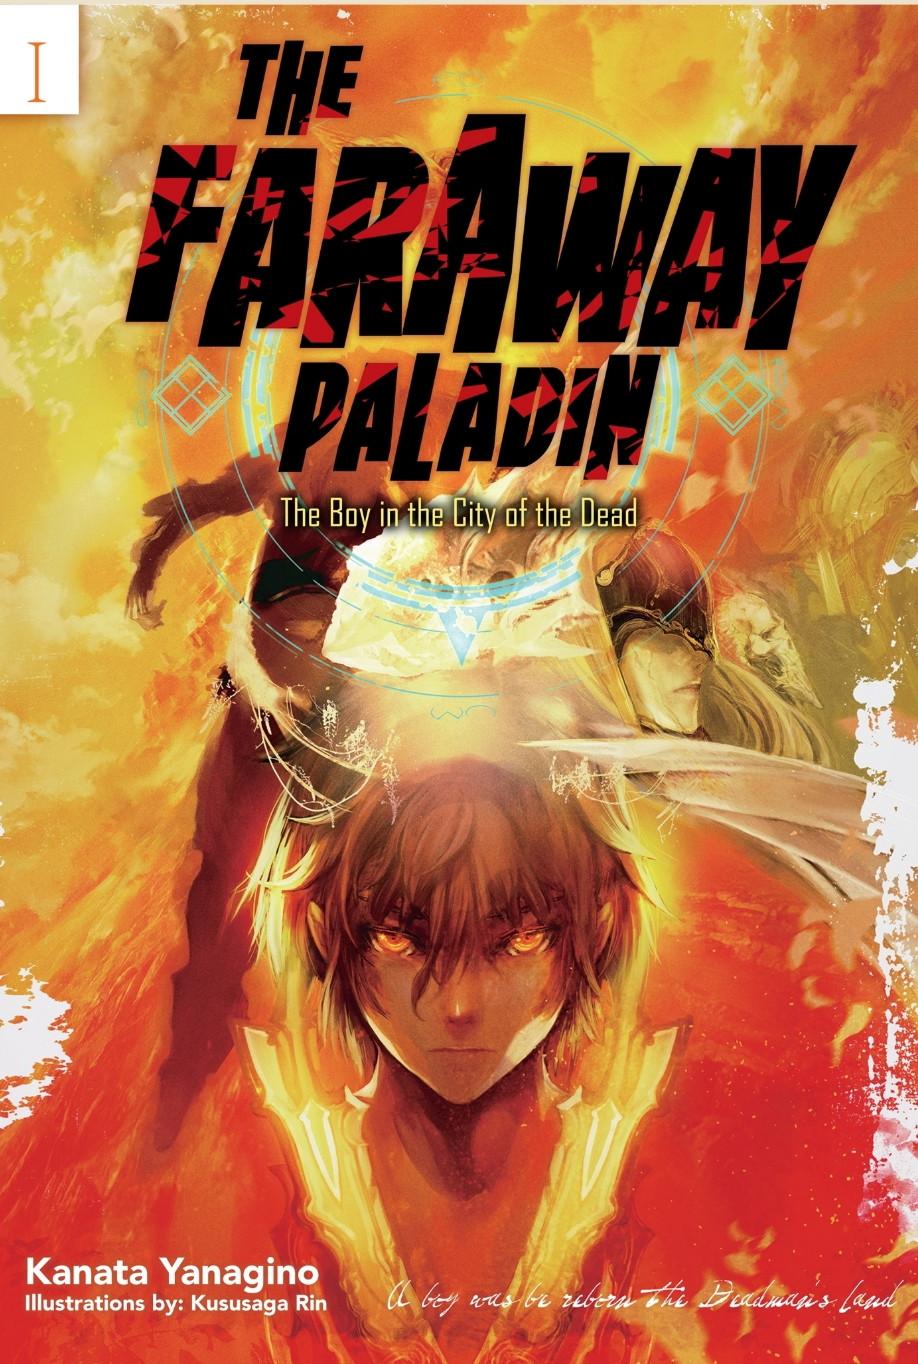 Far away paladin vol 1 book cover